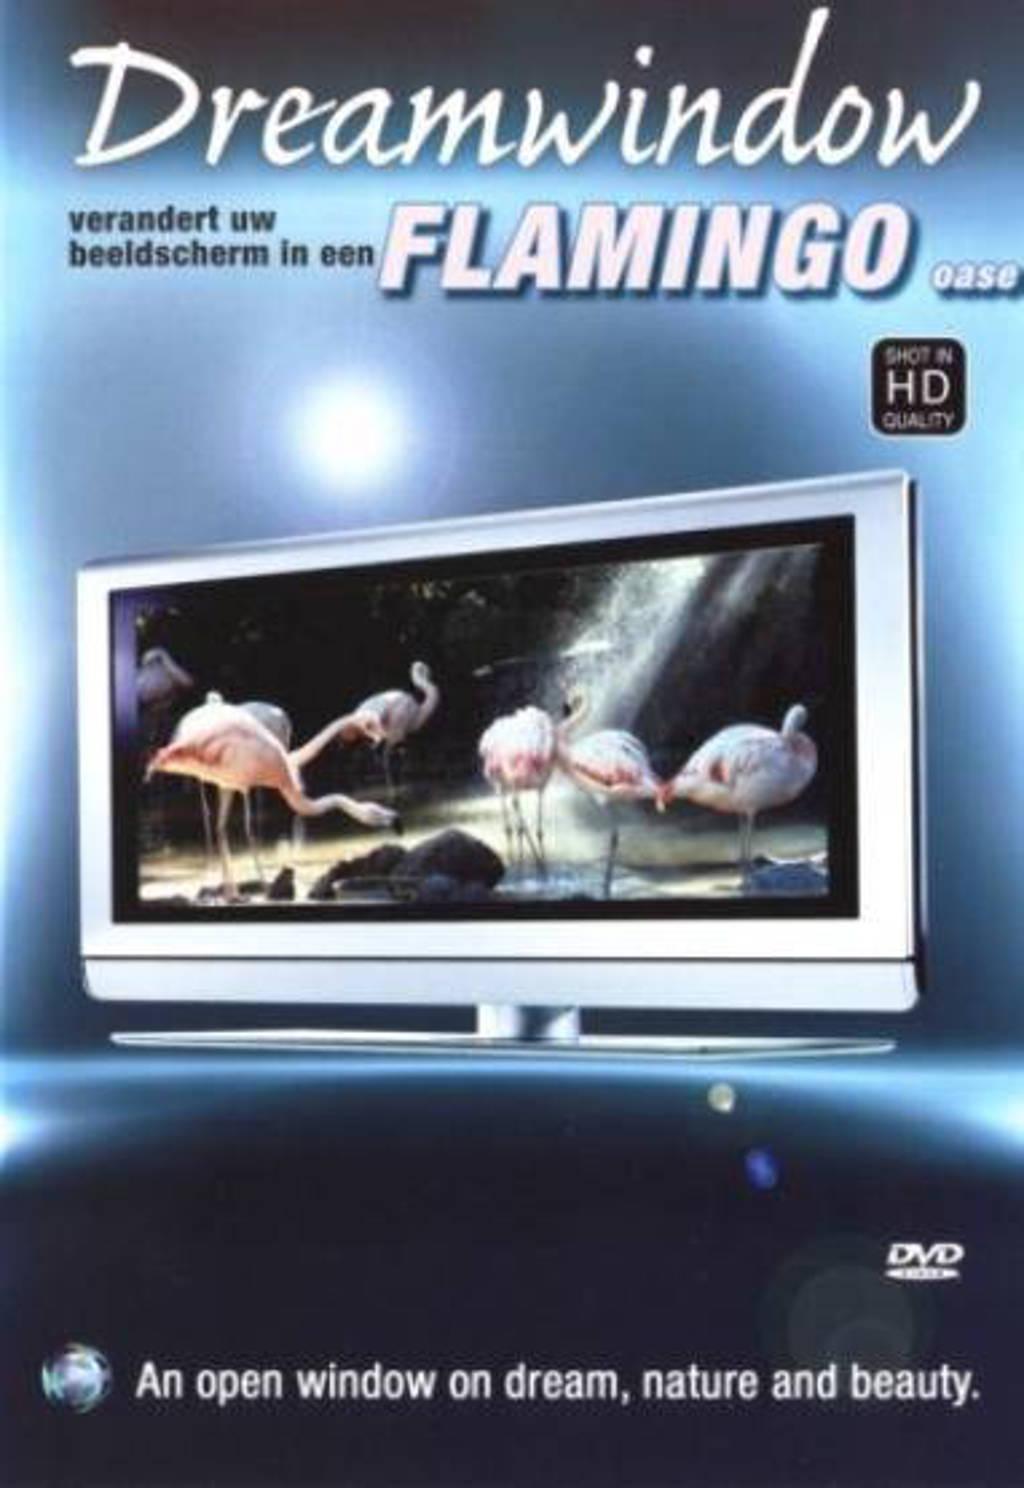 Dream window - flamingo's (DVD)